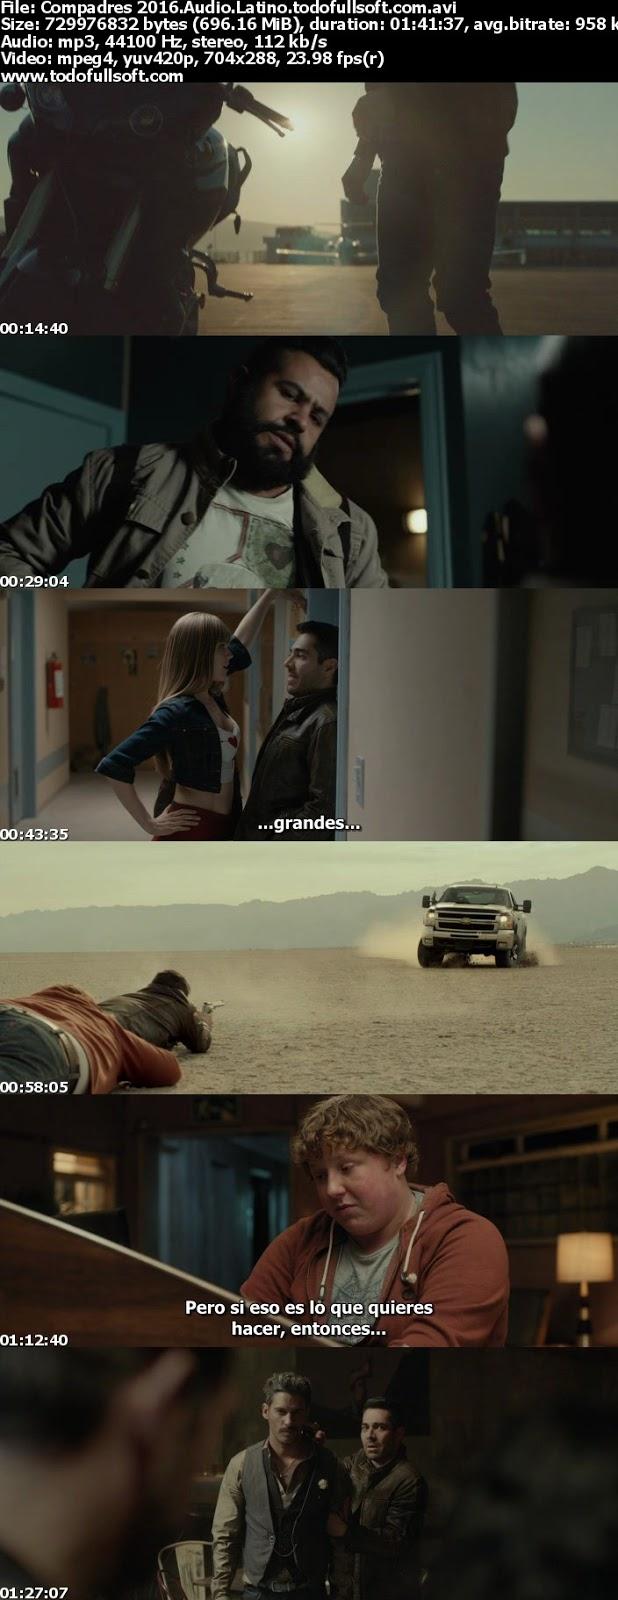 Compadres 2016 DVDrip (Español Latino)